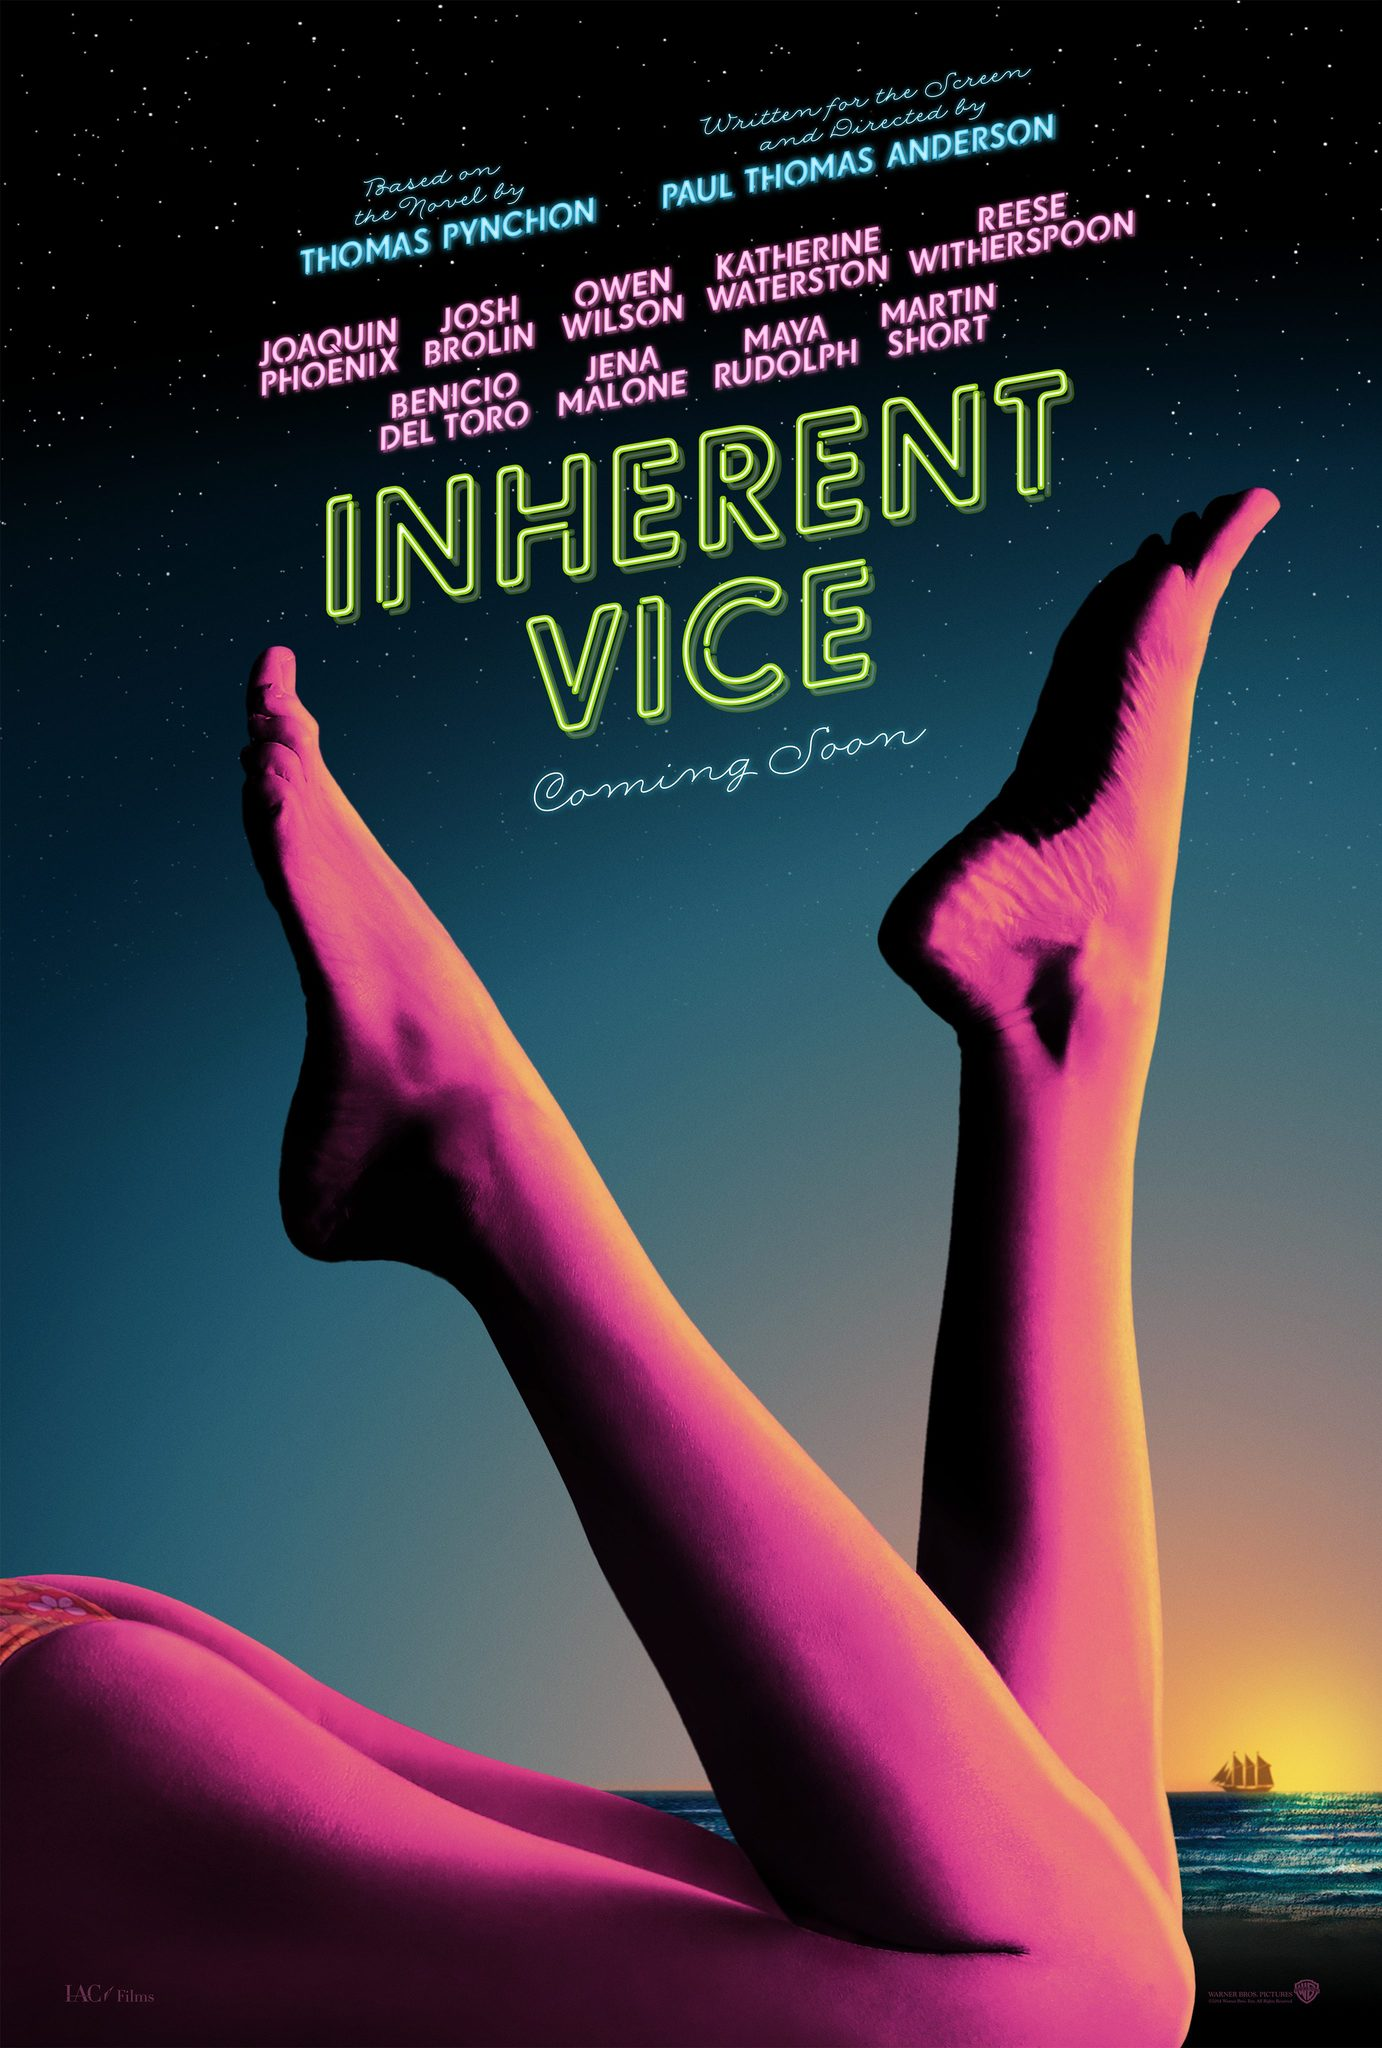 Inherent Vice full movie streaming